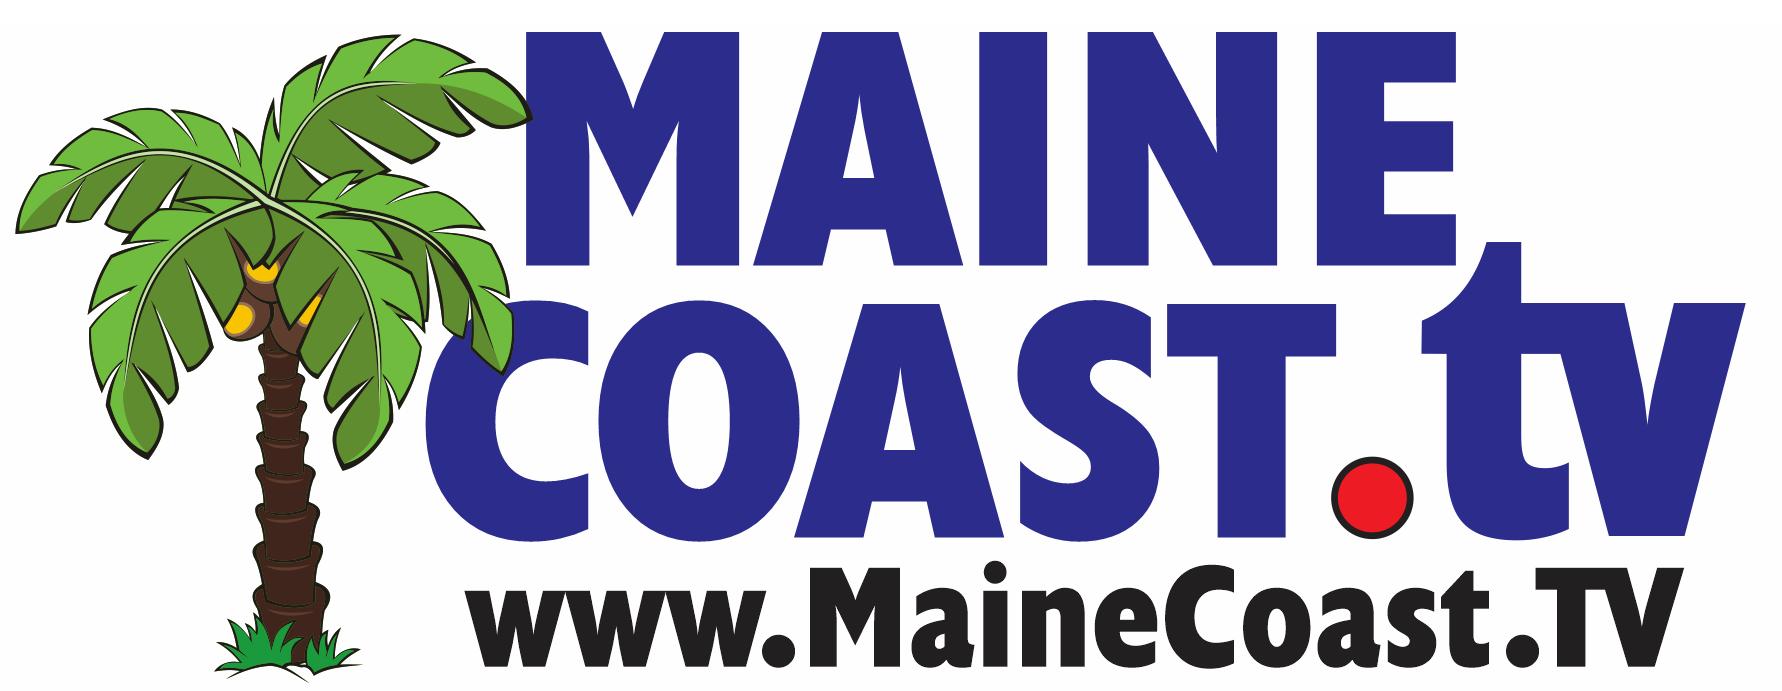 Maine Coast TV